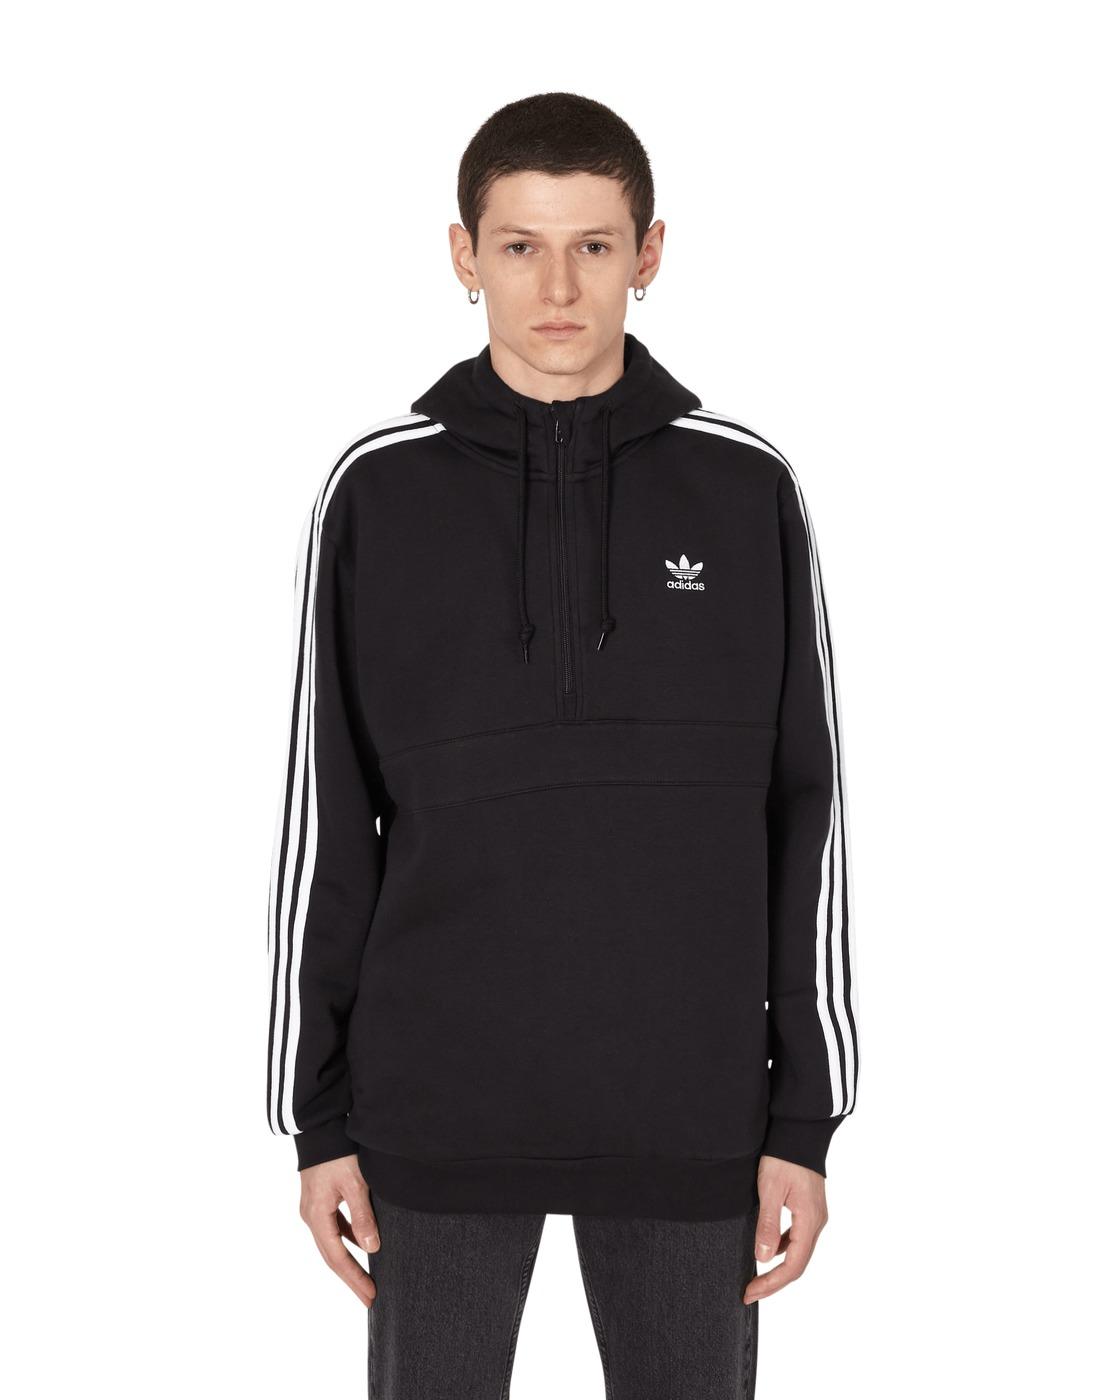 Adidas Originals 3 Stripes Hooded Sweatshirt Black